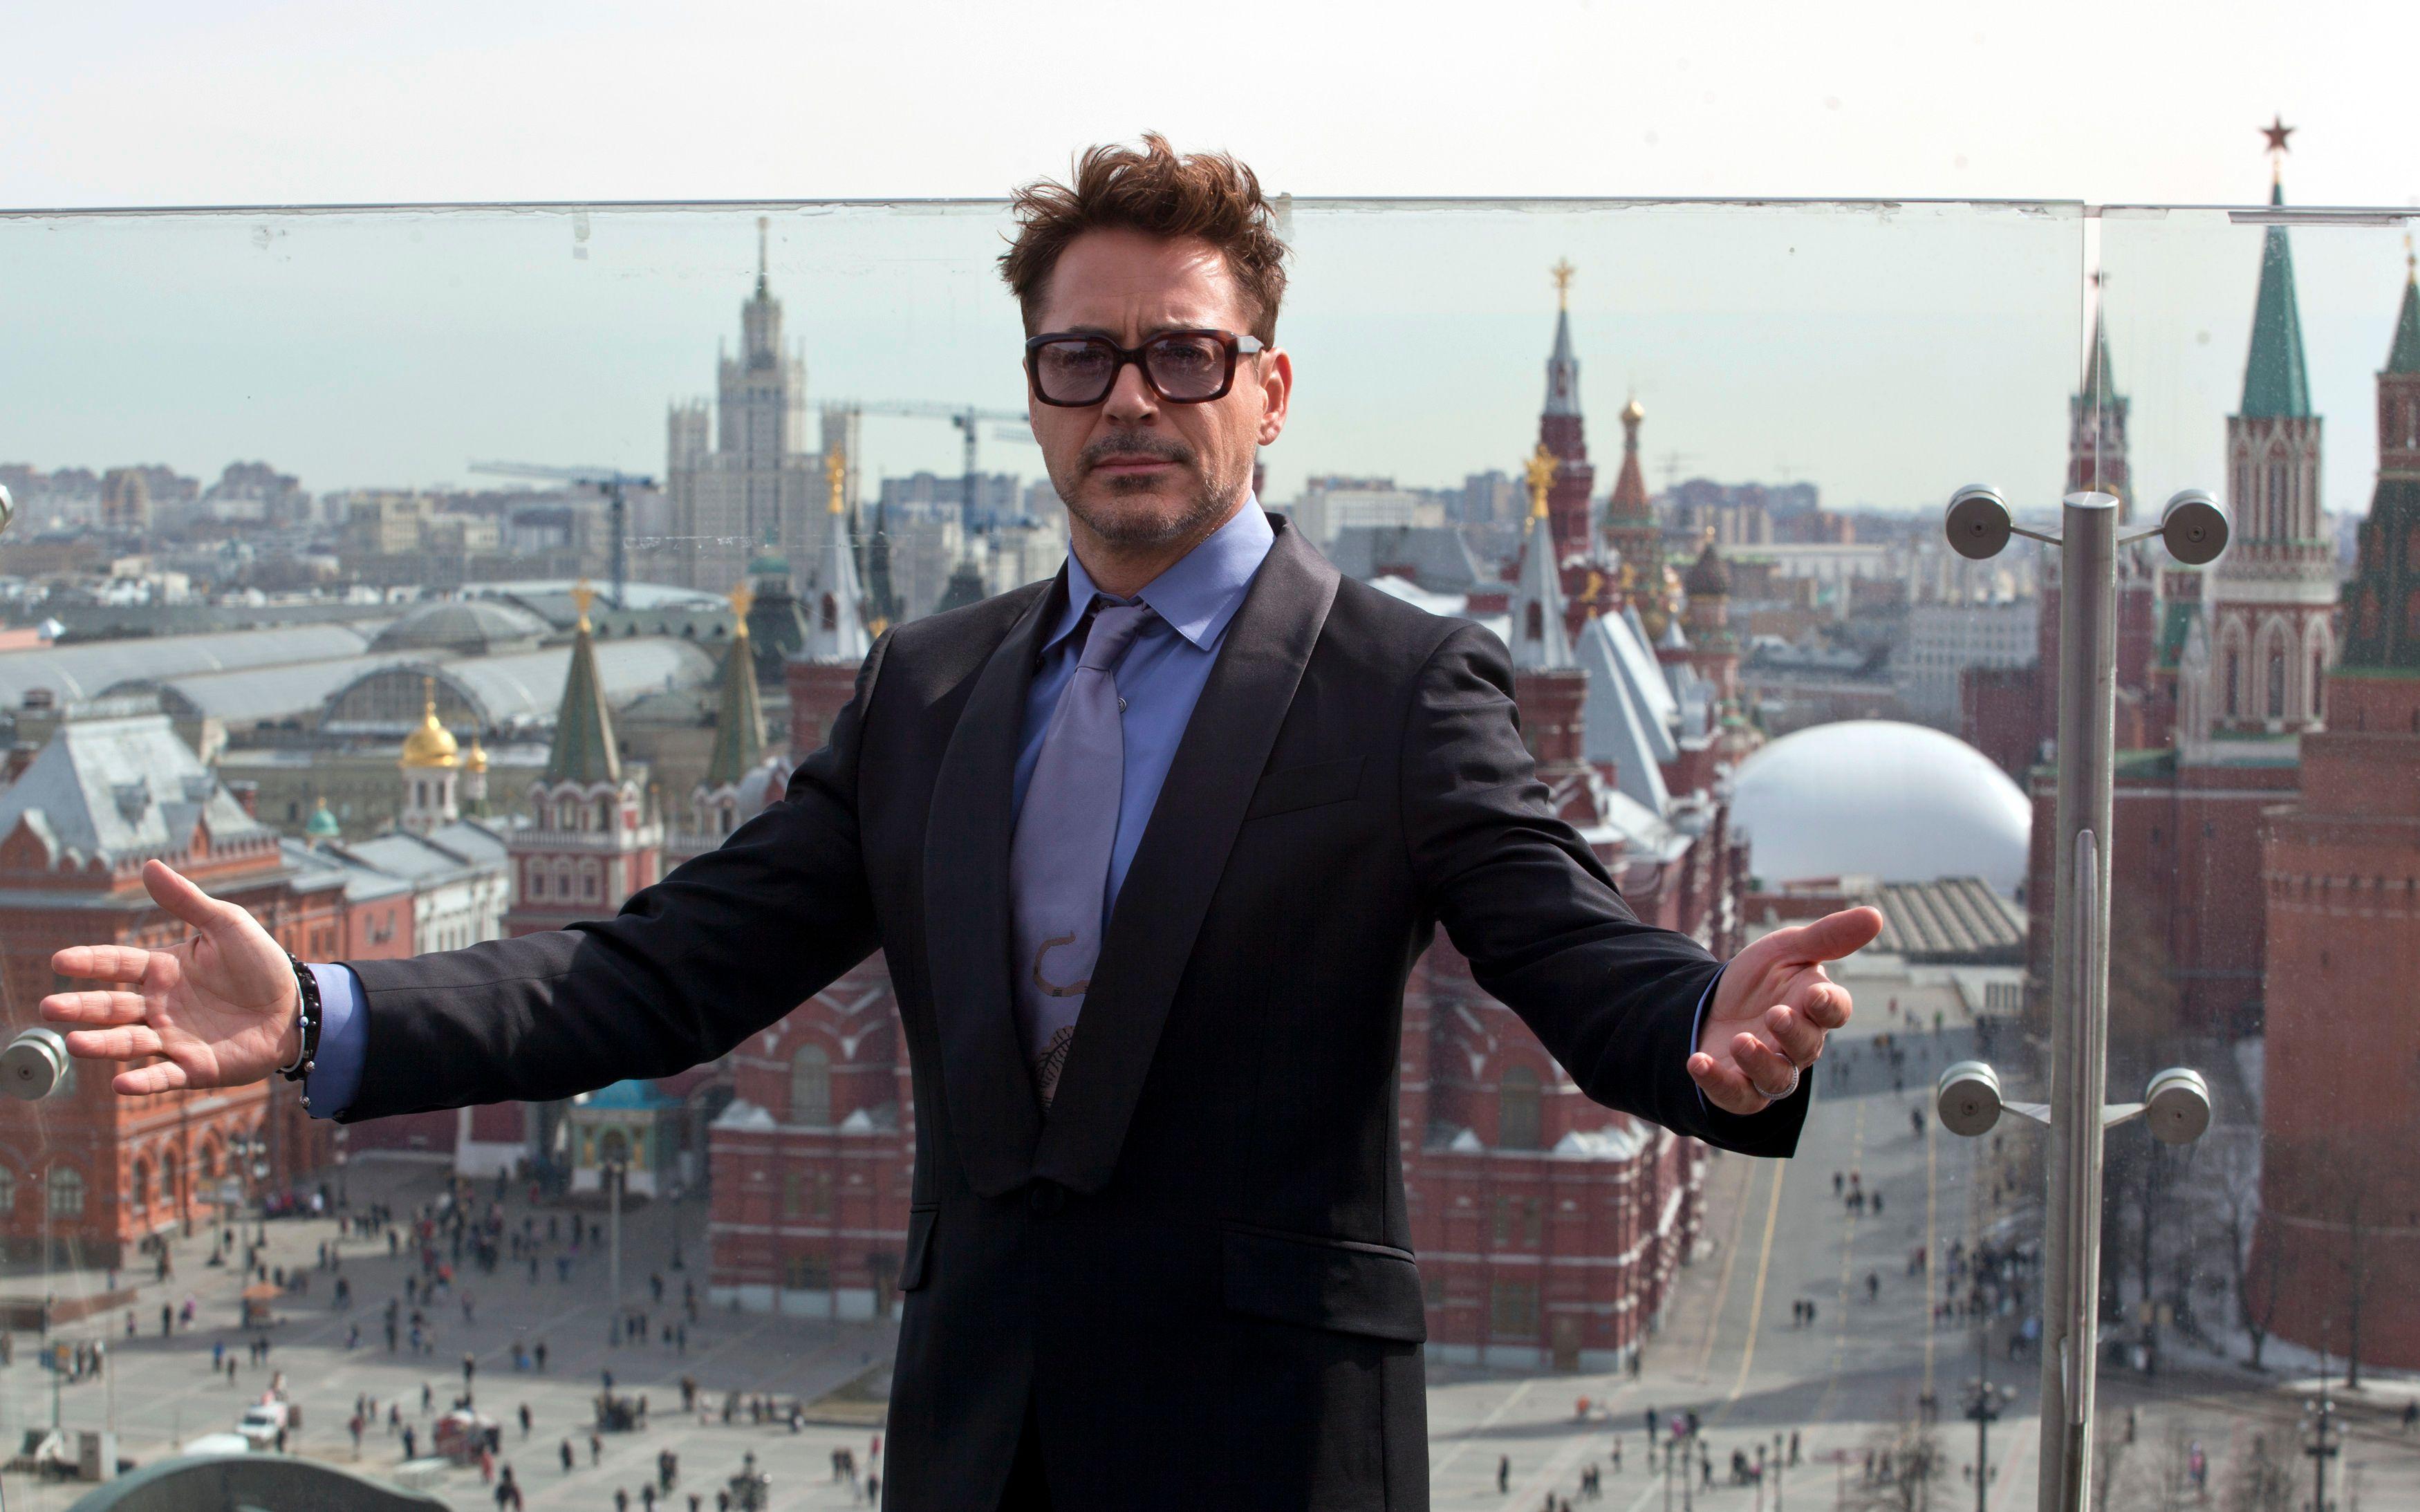 Robert Downey Jr a gagné 75 millions de dollars en 2013